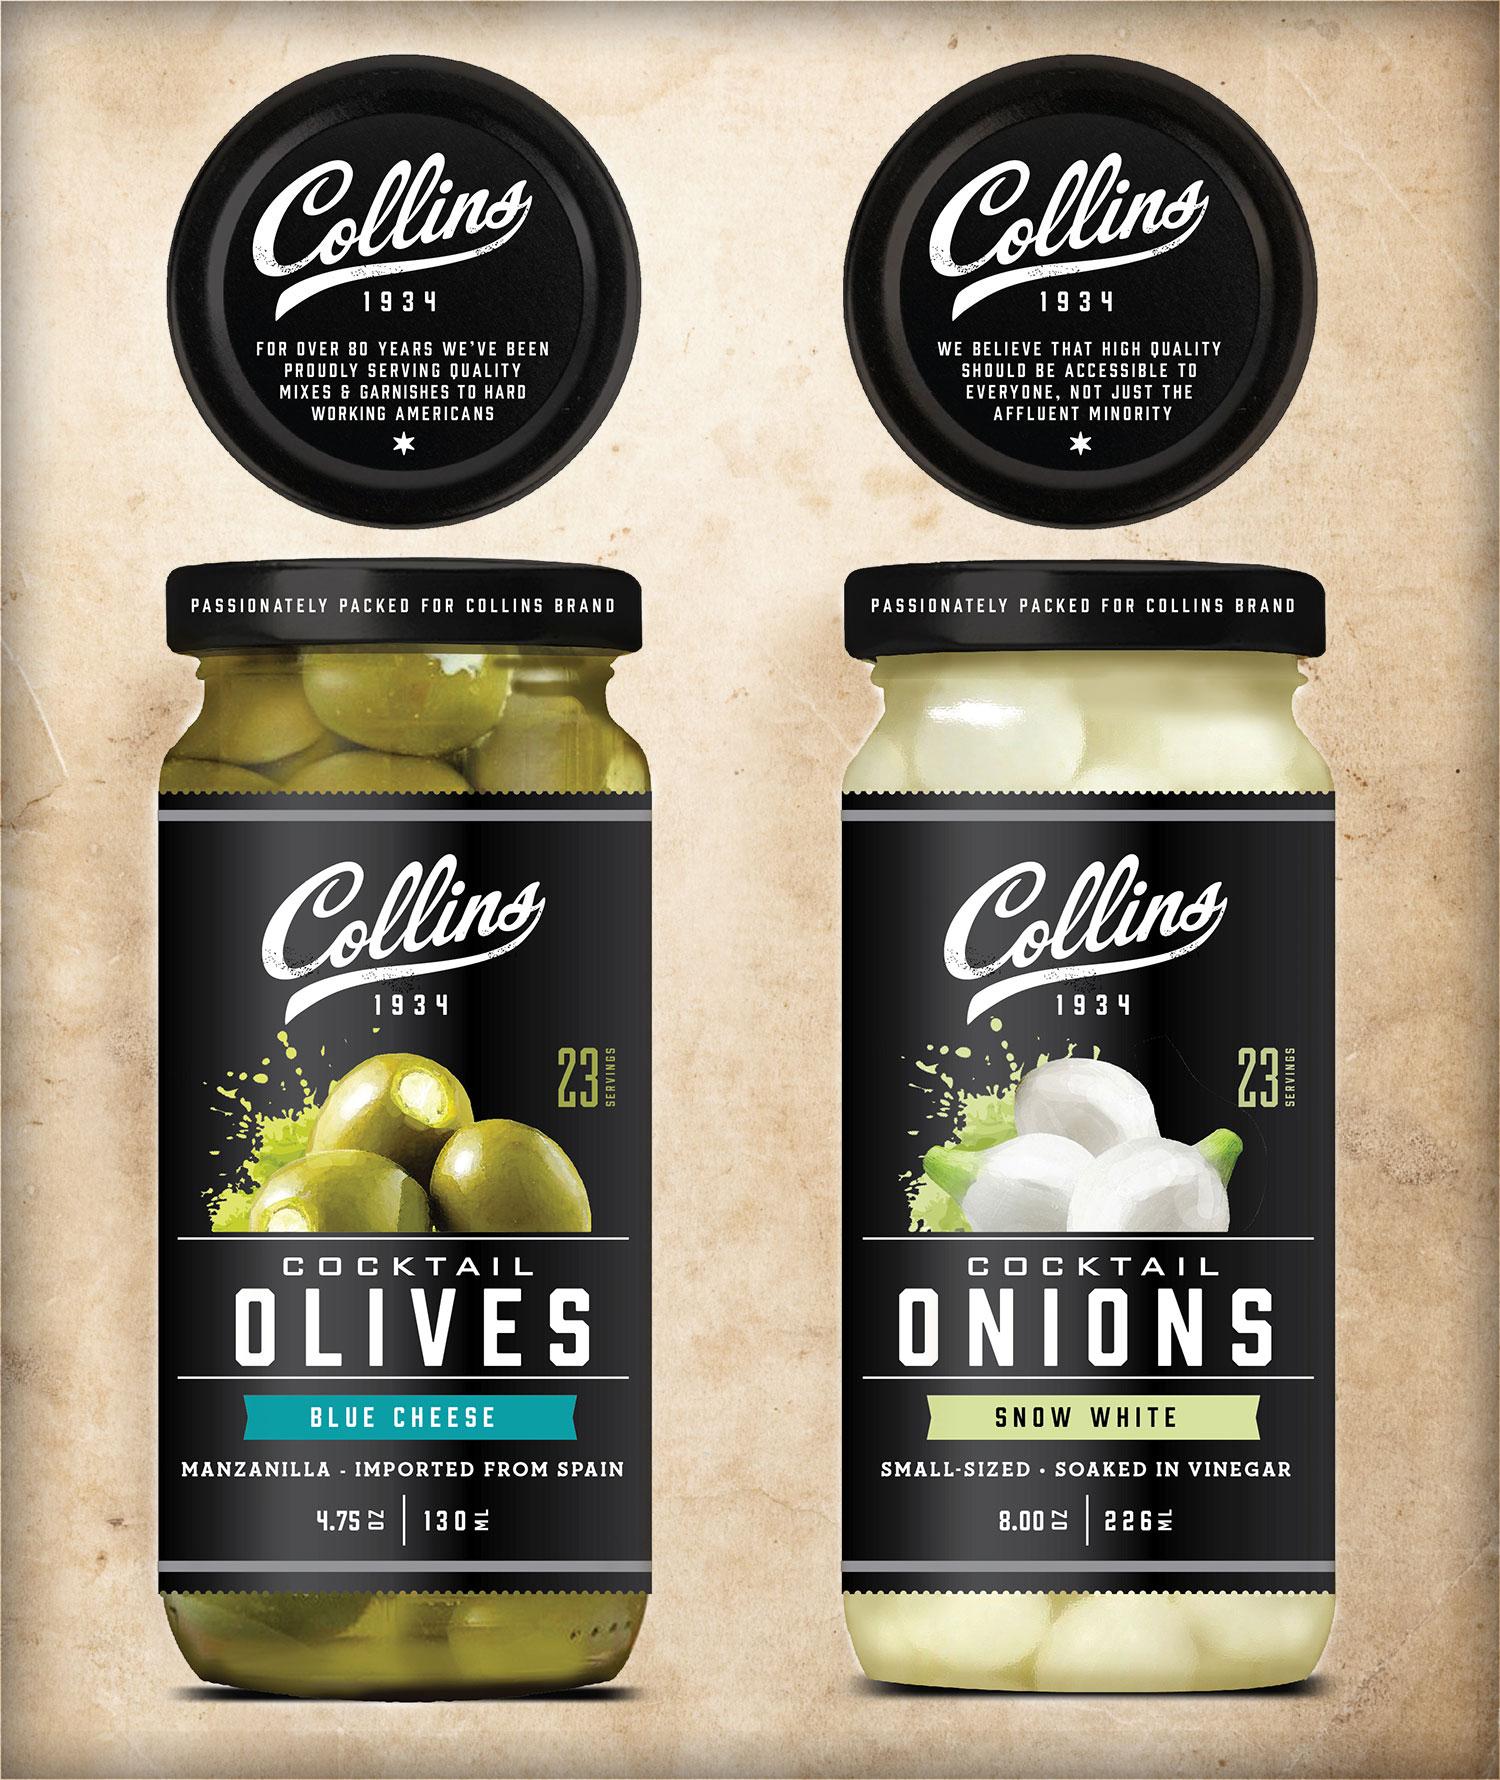 Collins-Rebrand-Packaging-Garnishes-Yuri-Shvets-32.jpg